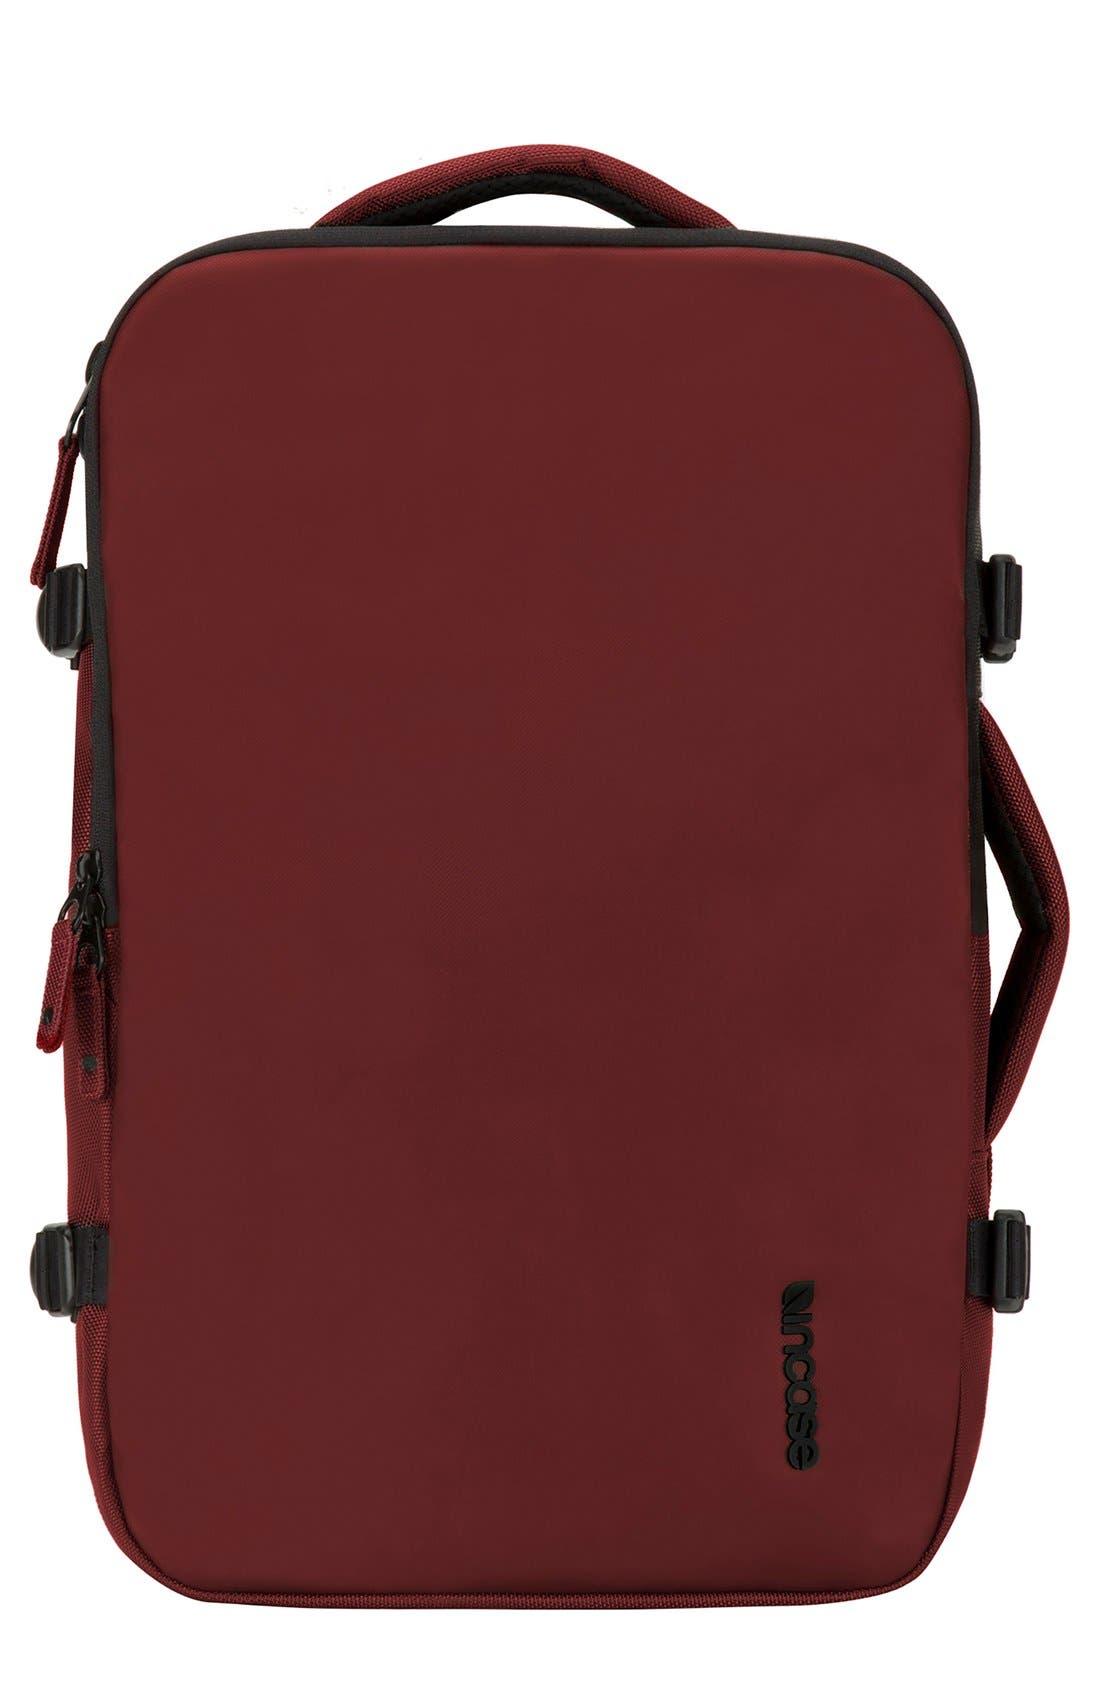 INCASE DESIGNS VIA Backpack